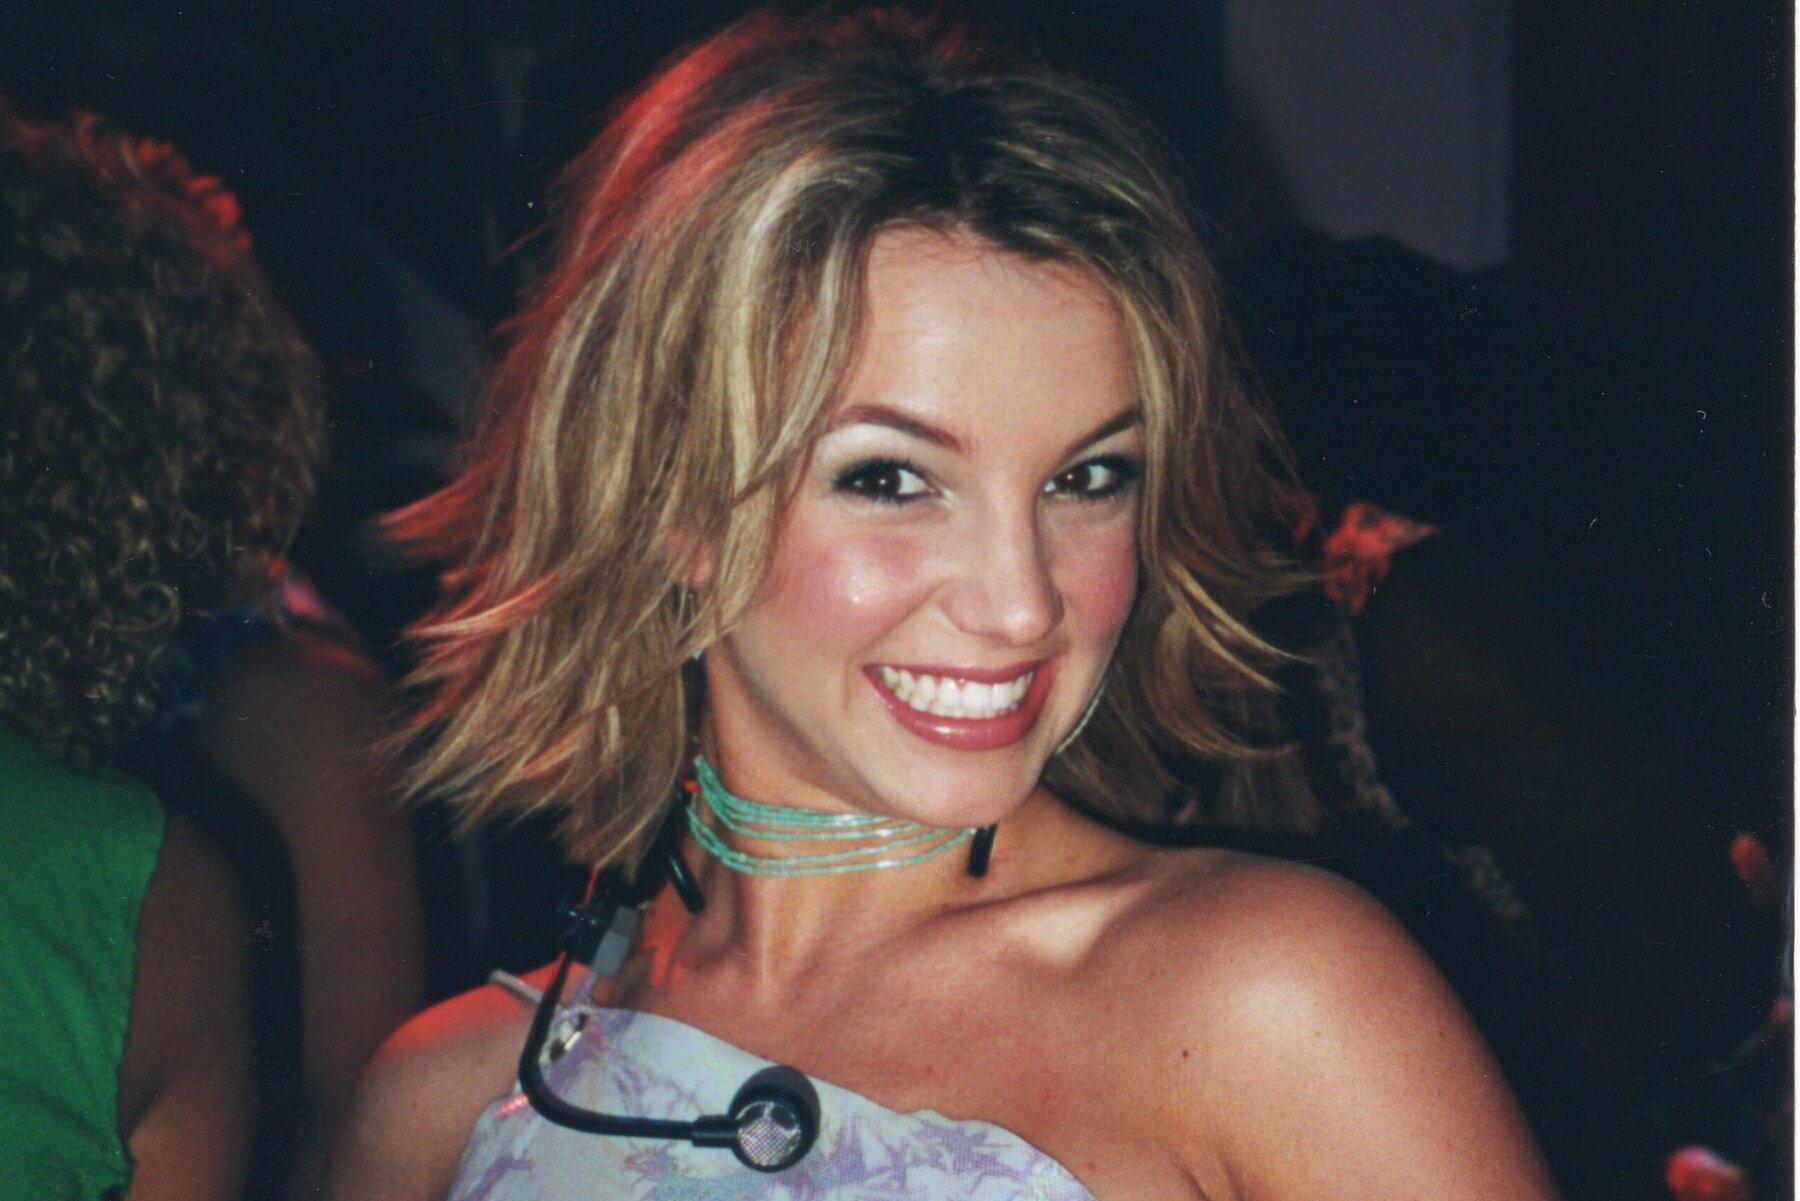 #WeAreSorryBritney: El impresionante documental de Britney Spears quiebra a Internet